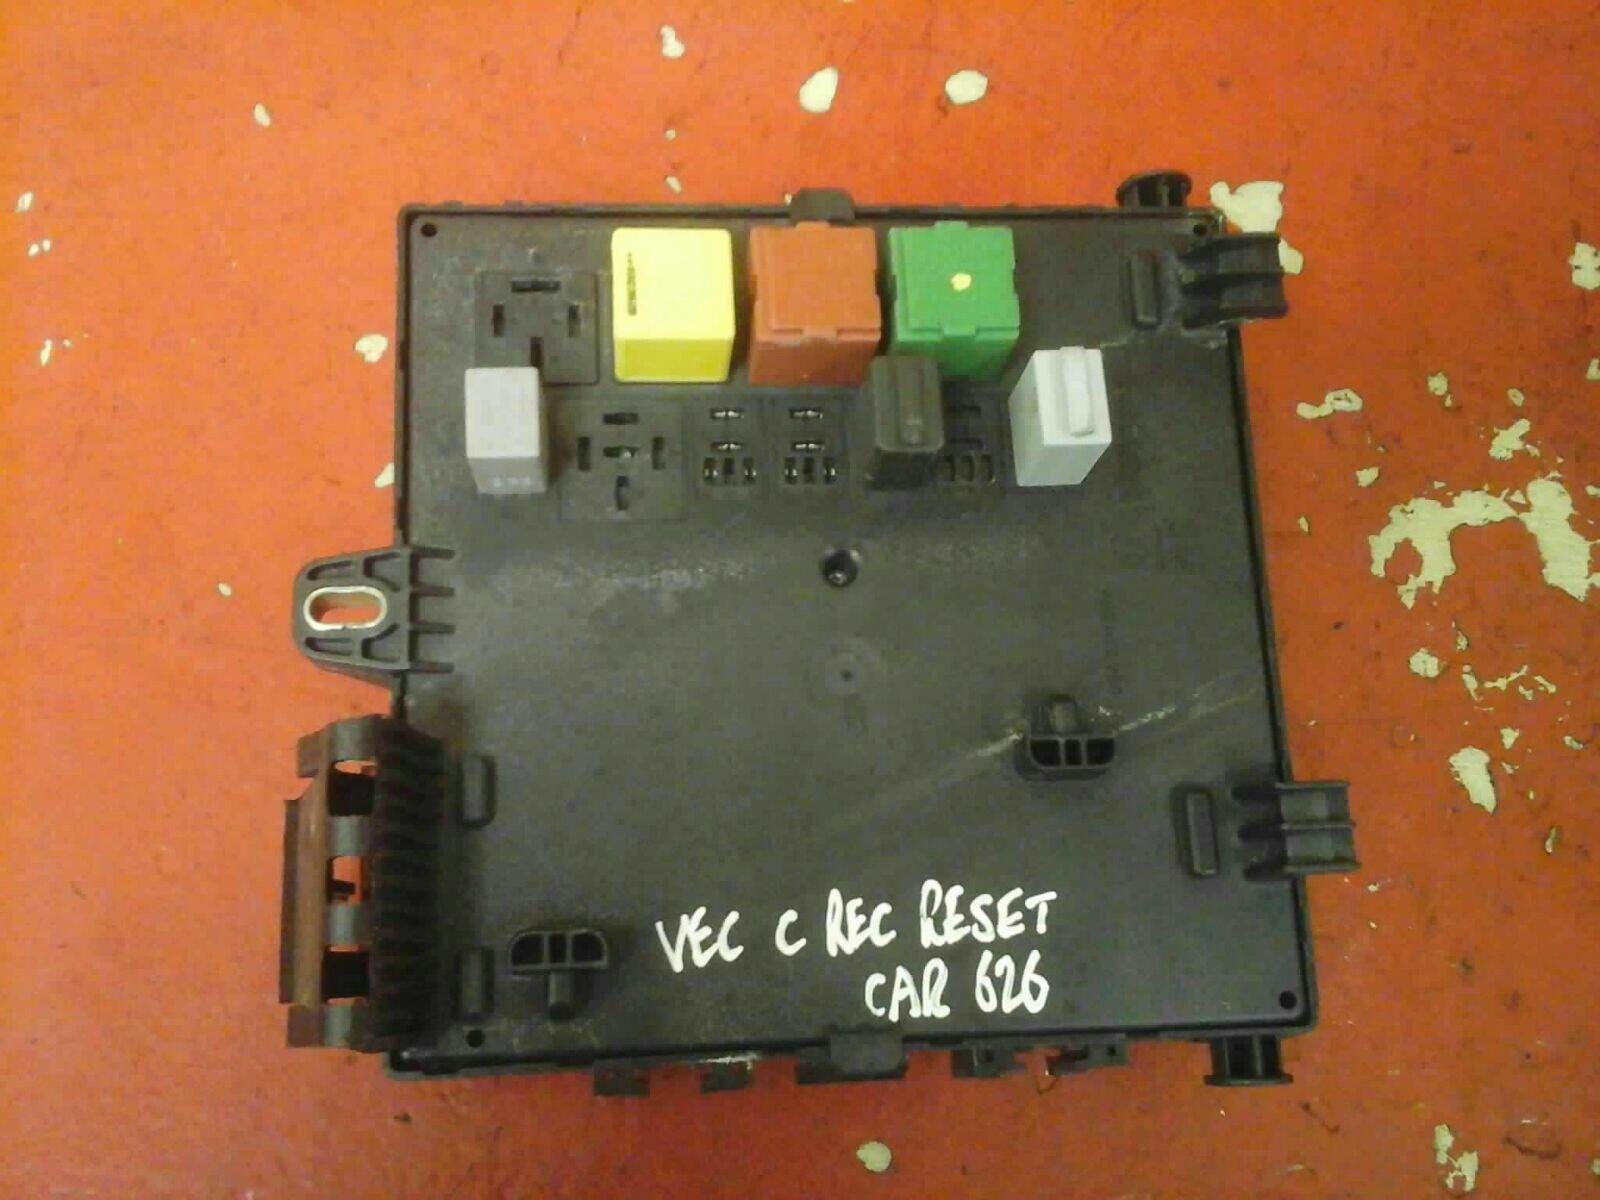 vauxhall vectra c rec rear electrical control module fuse box bg 2002-2009